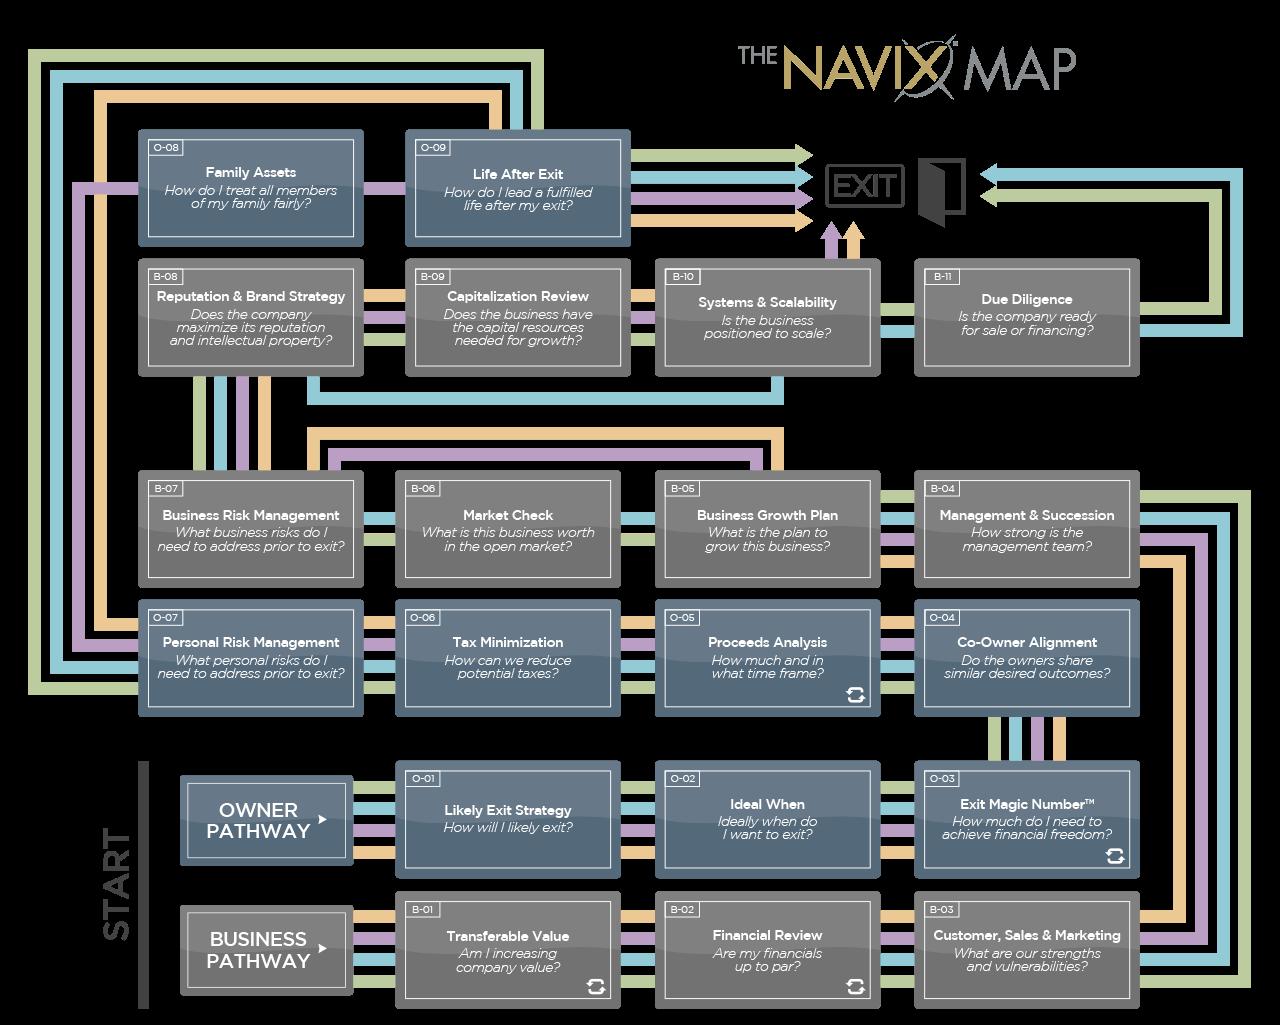 The NAVIX Map